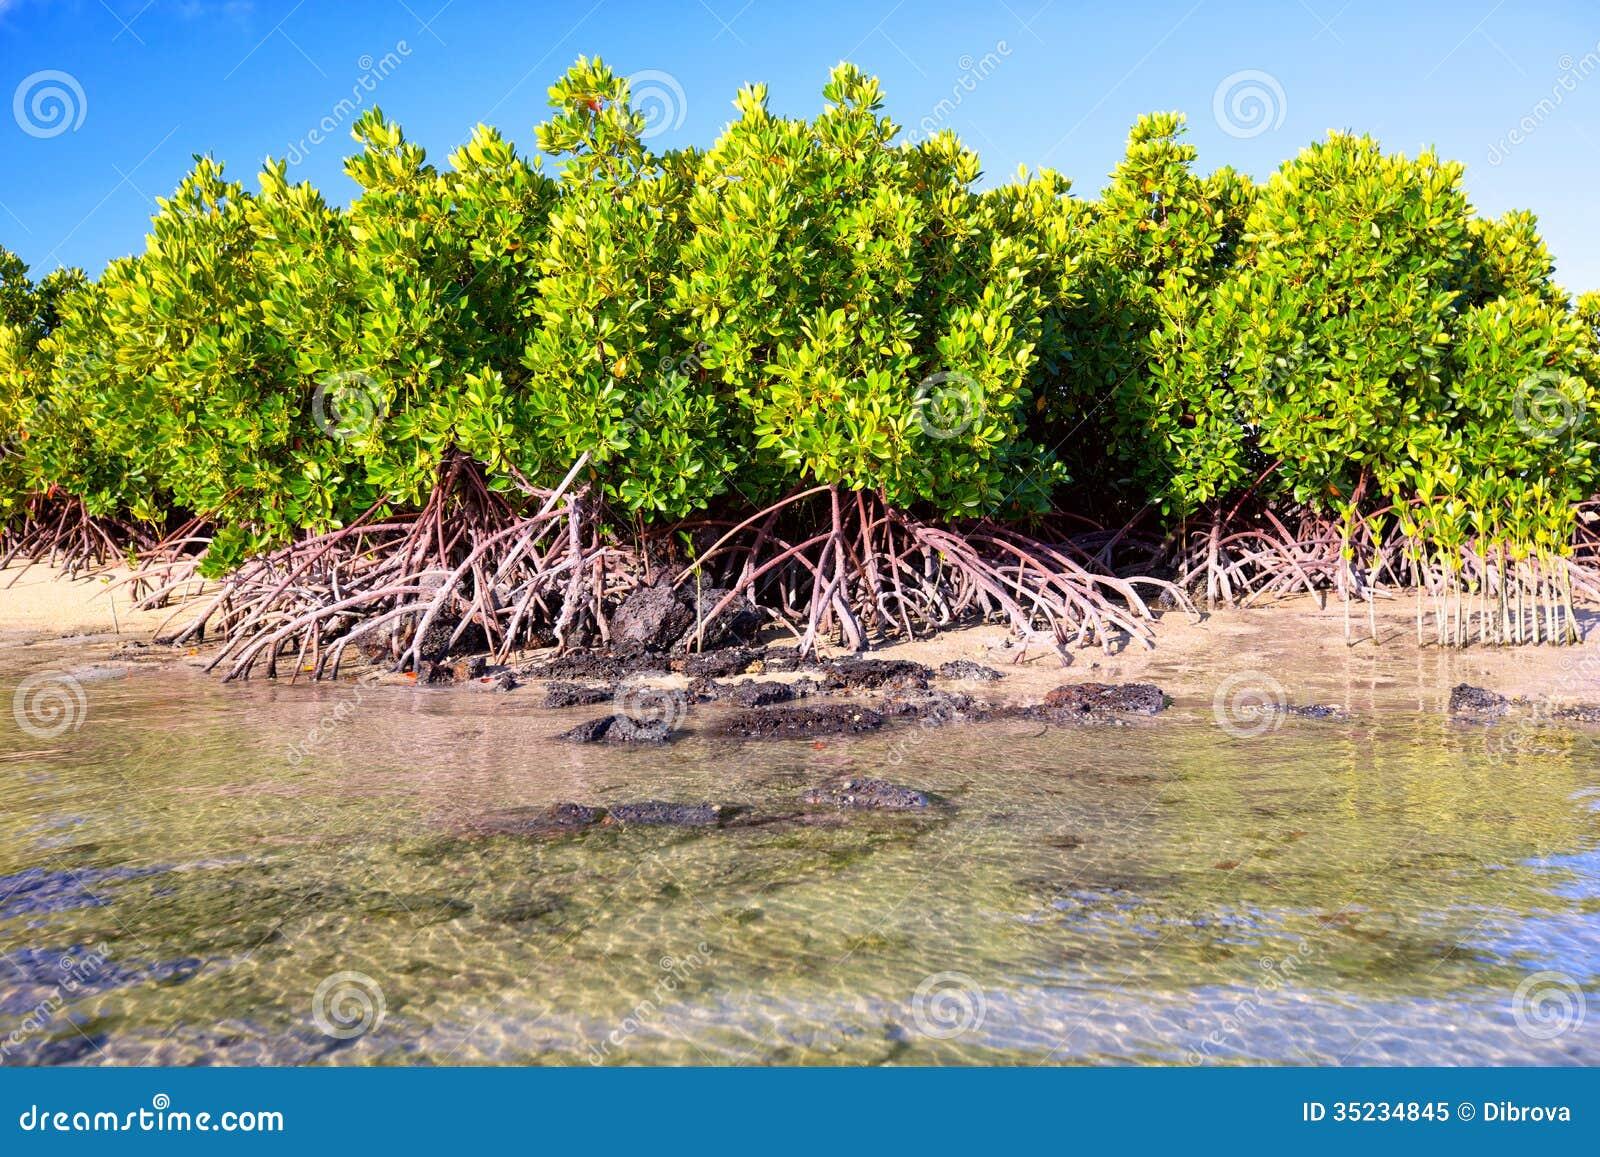 Plantas dos manguezais